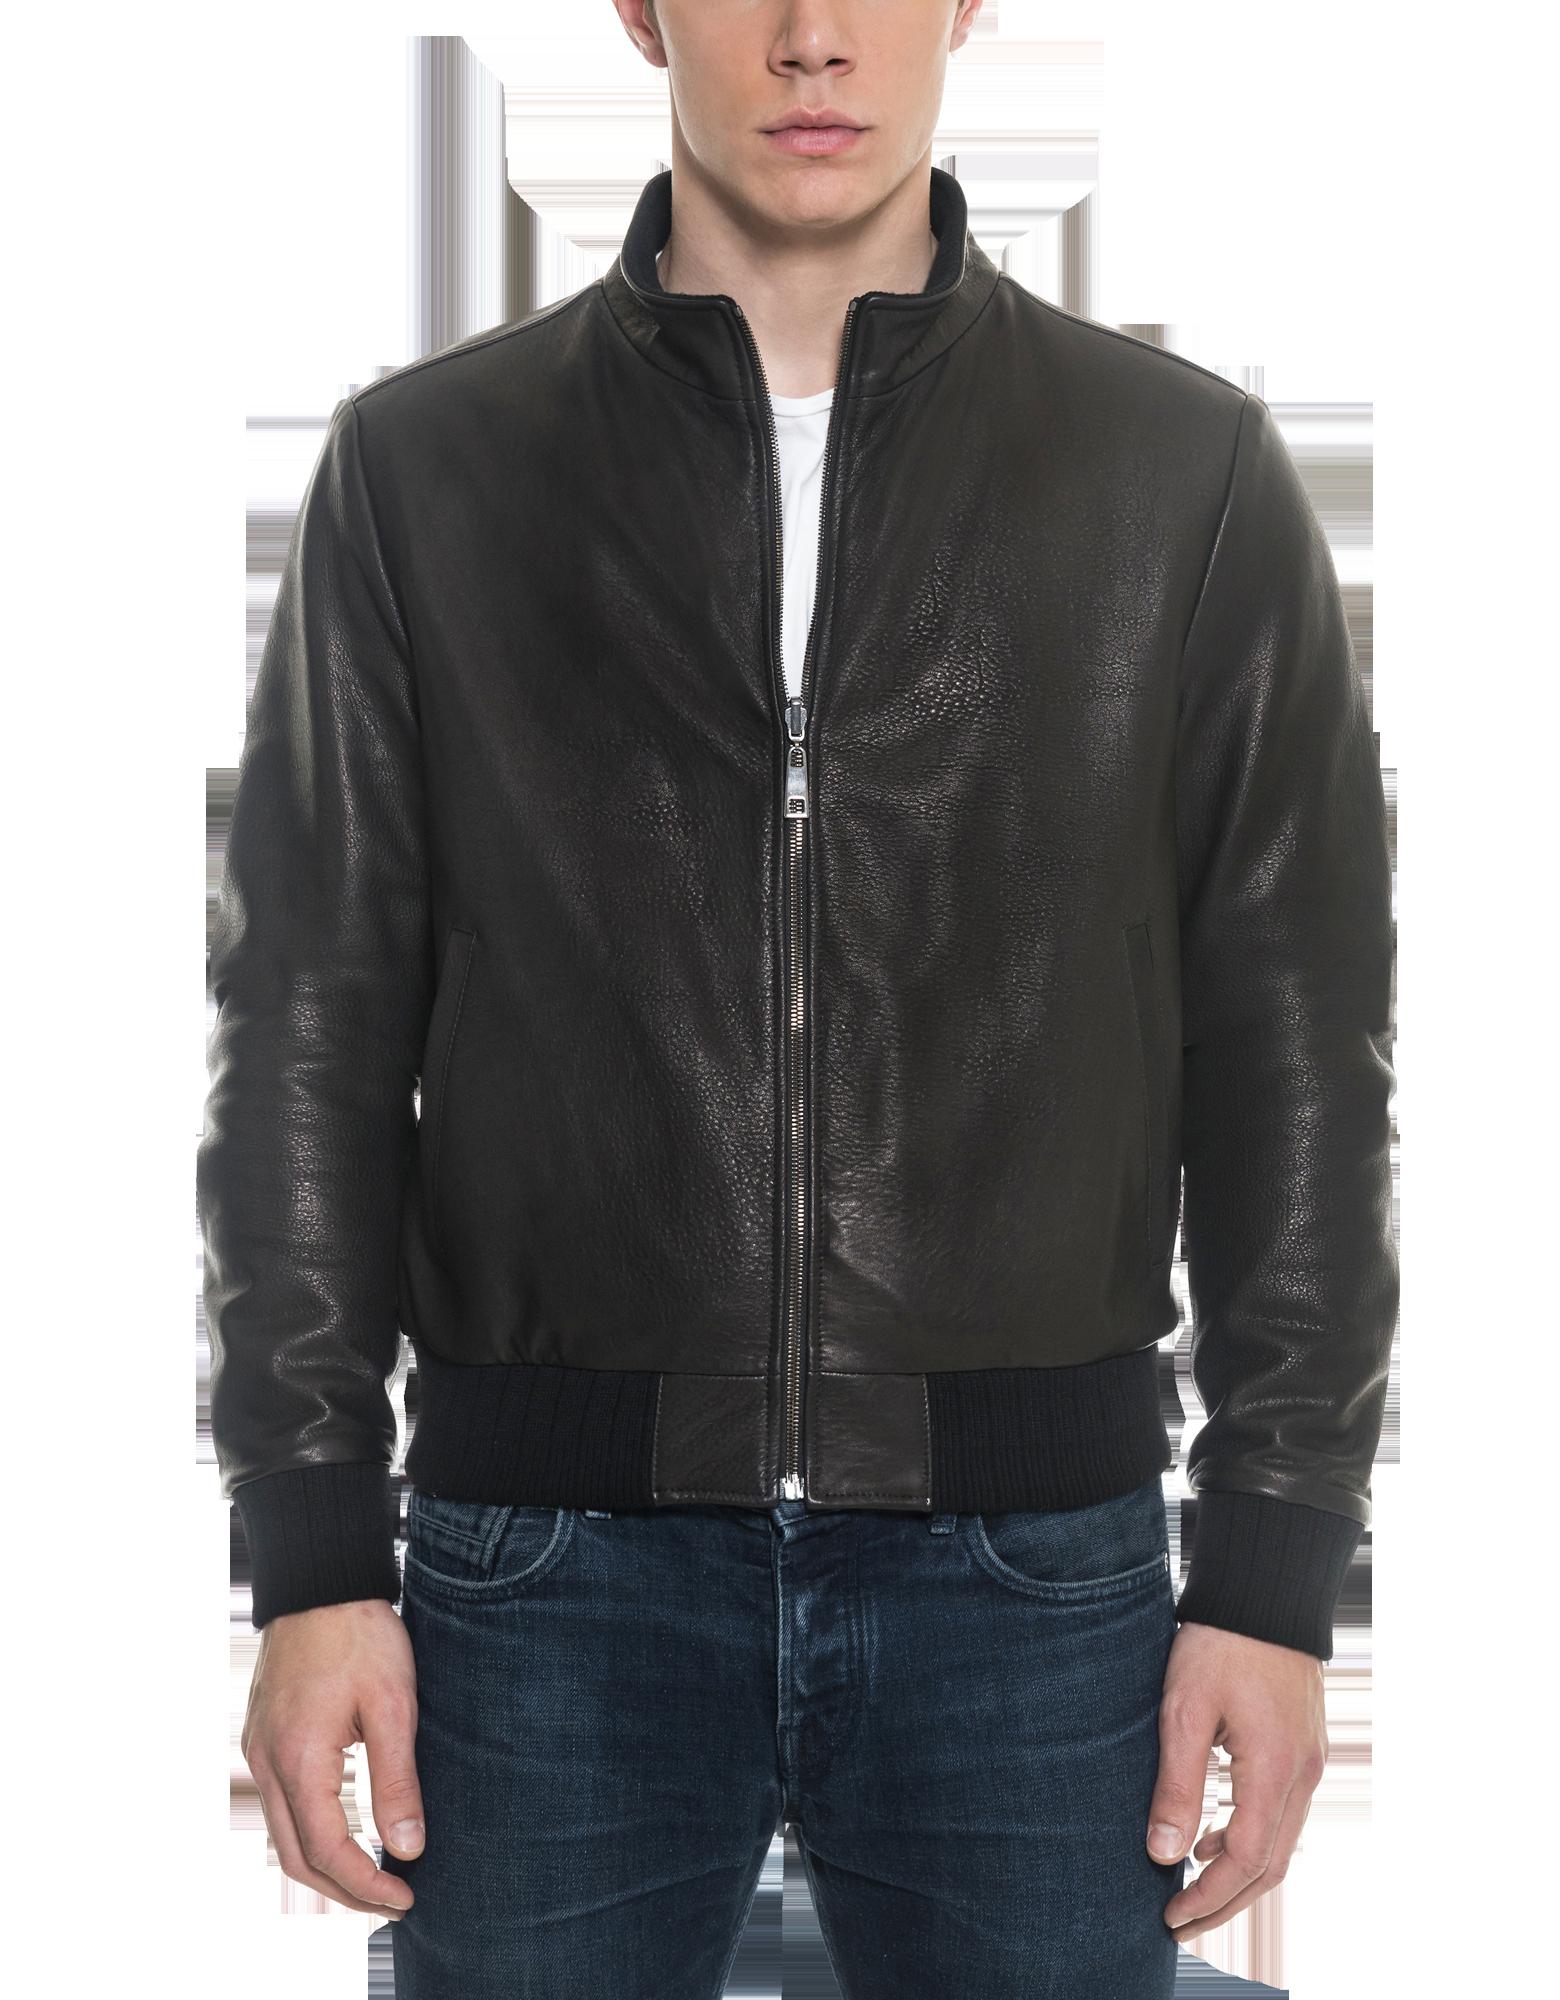 Image of Black Leather and Nylon Men's Reversible Jacket